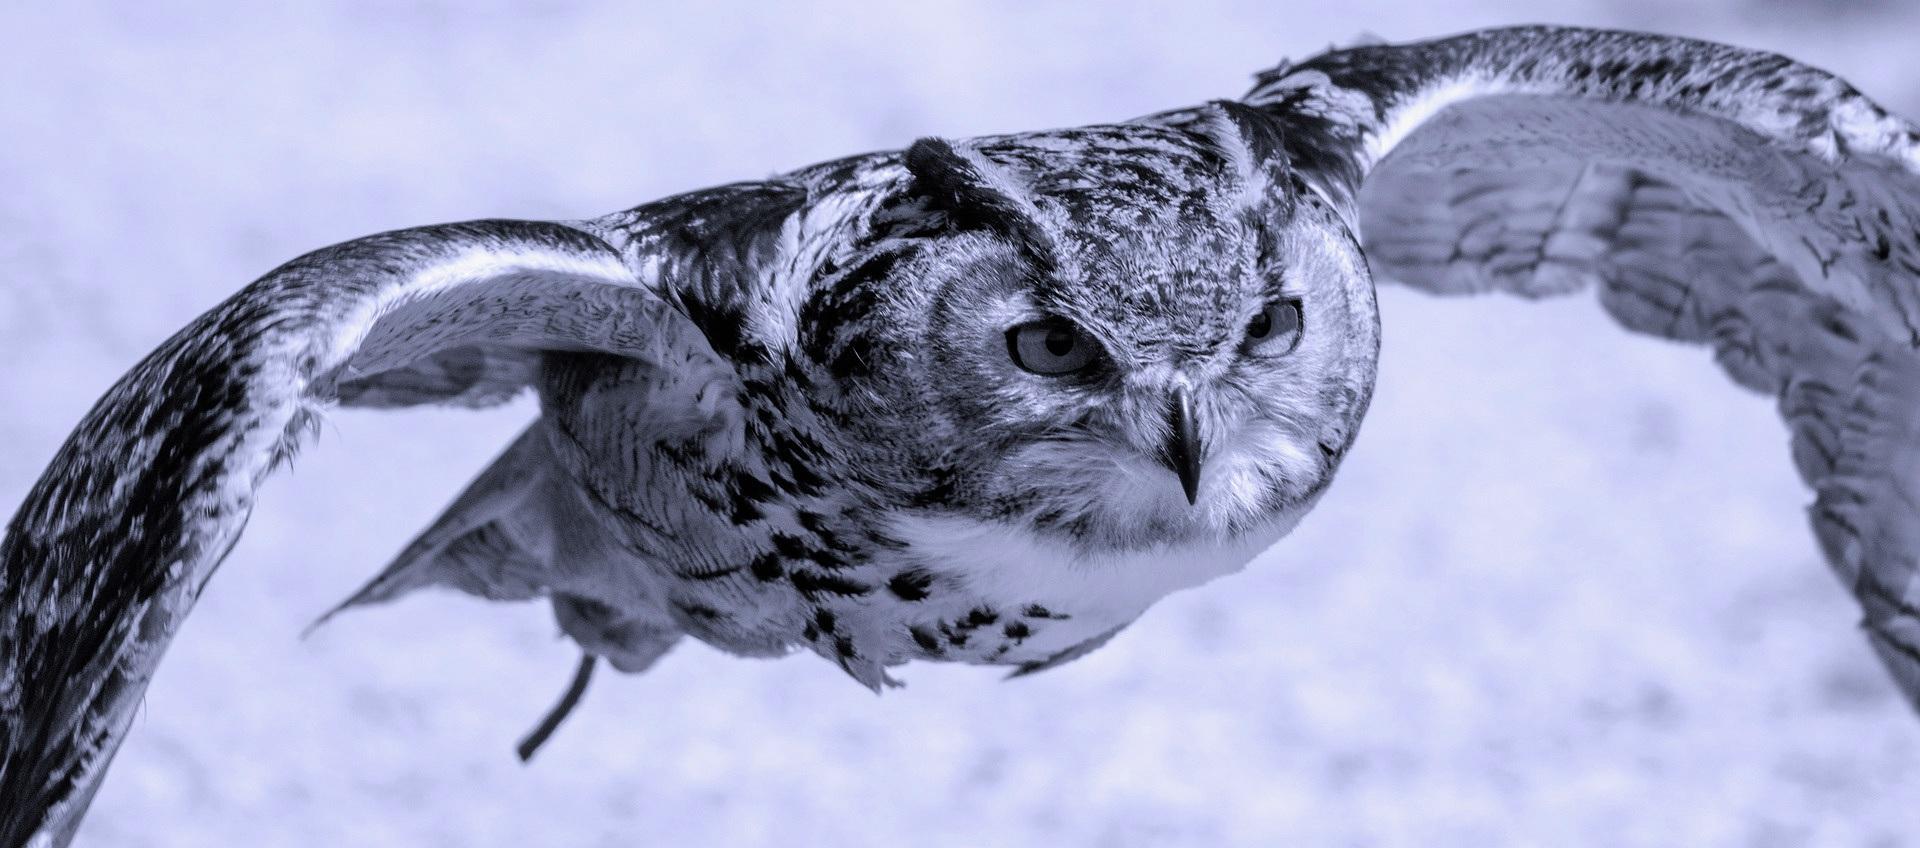 Owl+Free+Flying